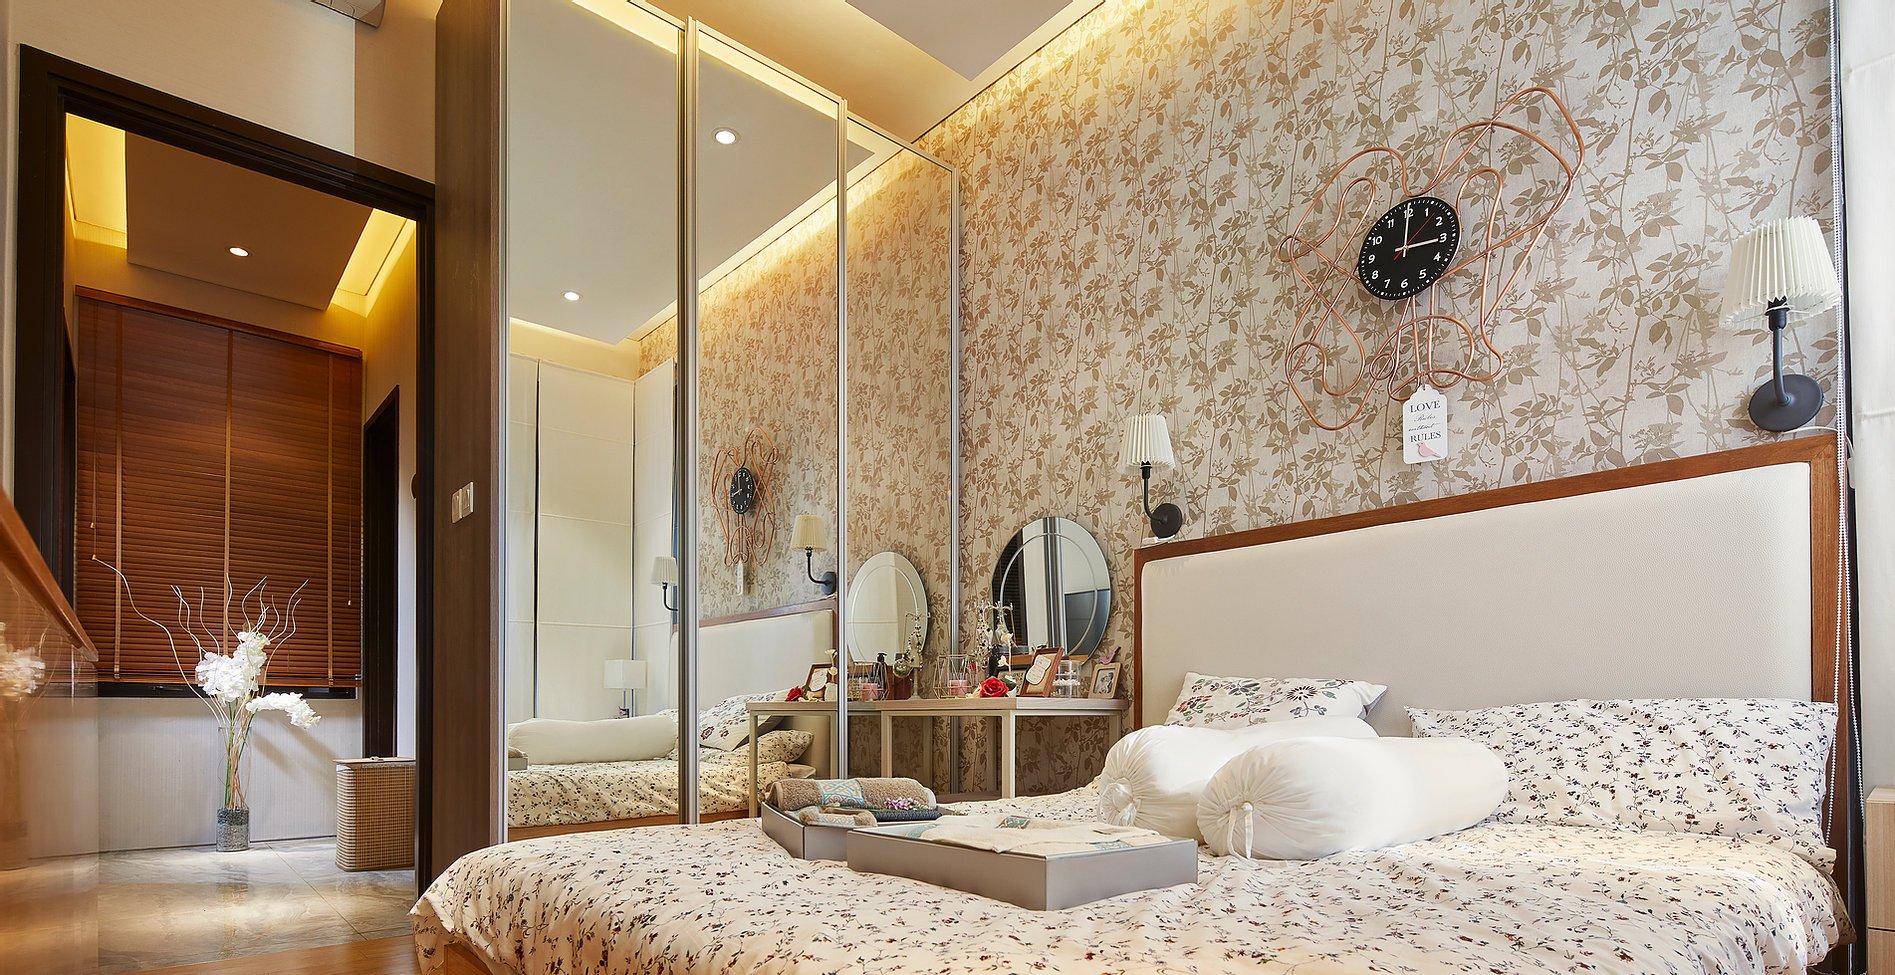 Lavon Swan City tipe C Master Bedroom